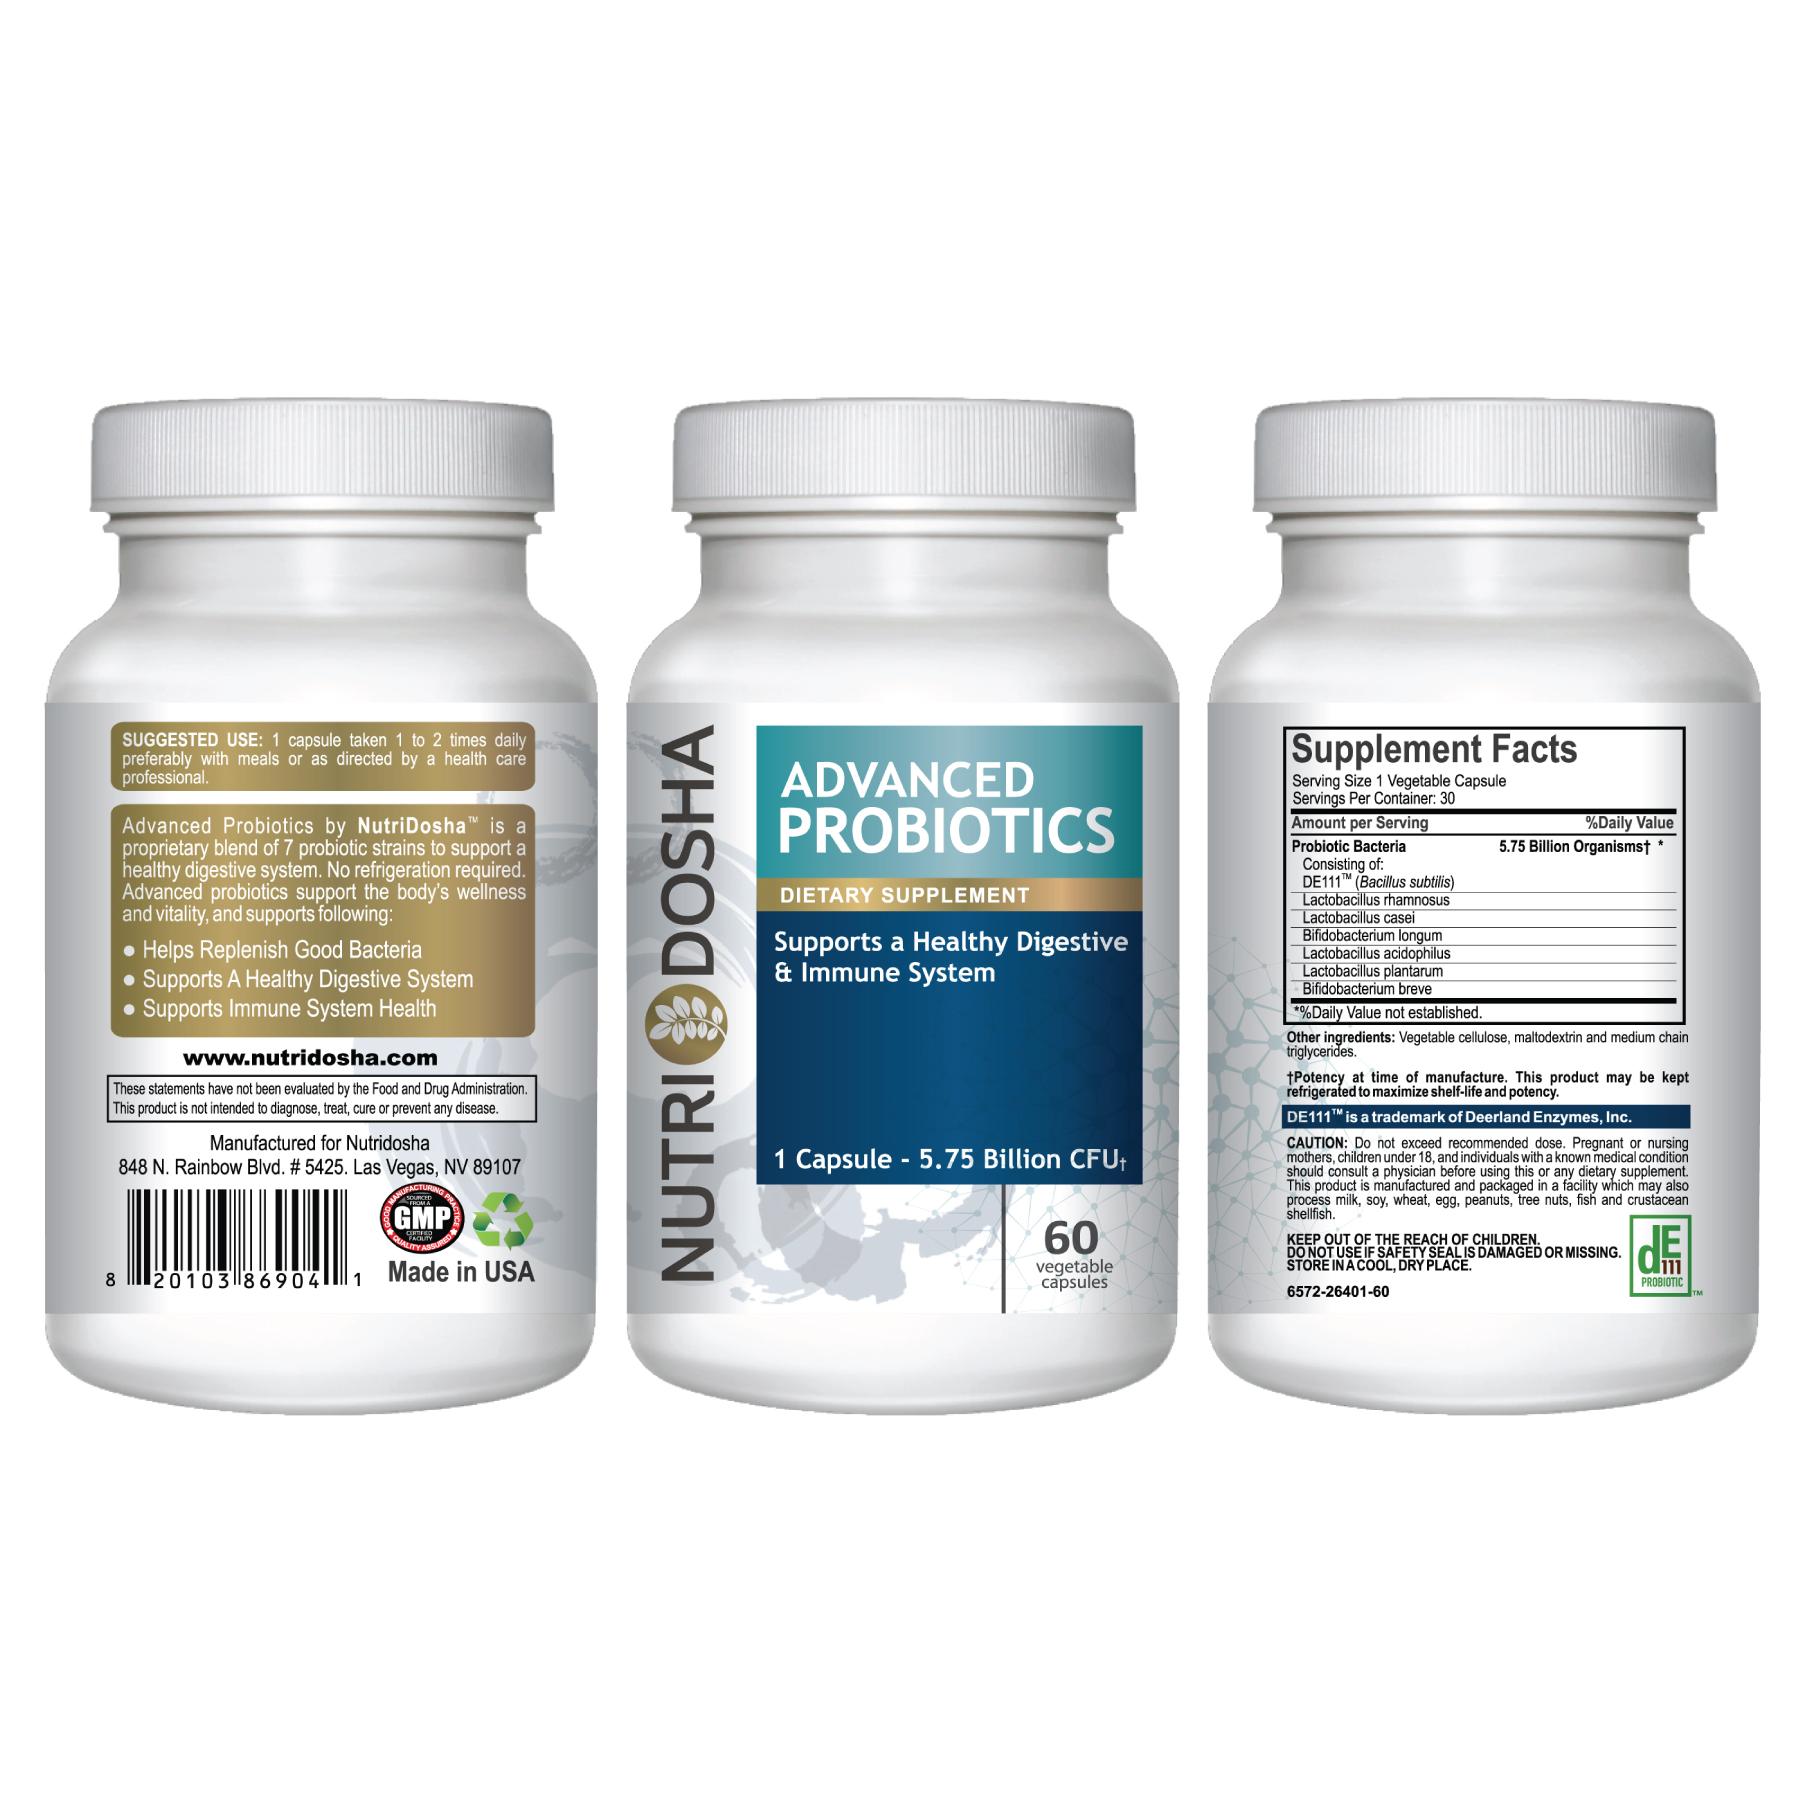 Nutridosha Advanced Probiotics #nutridosha